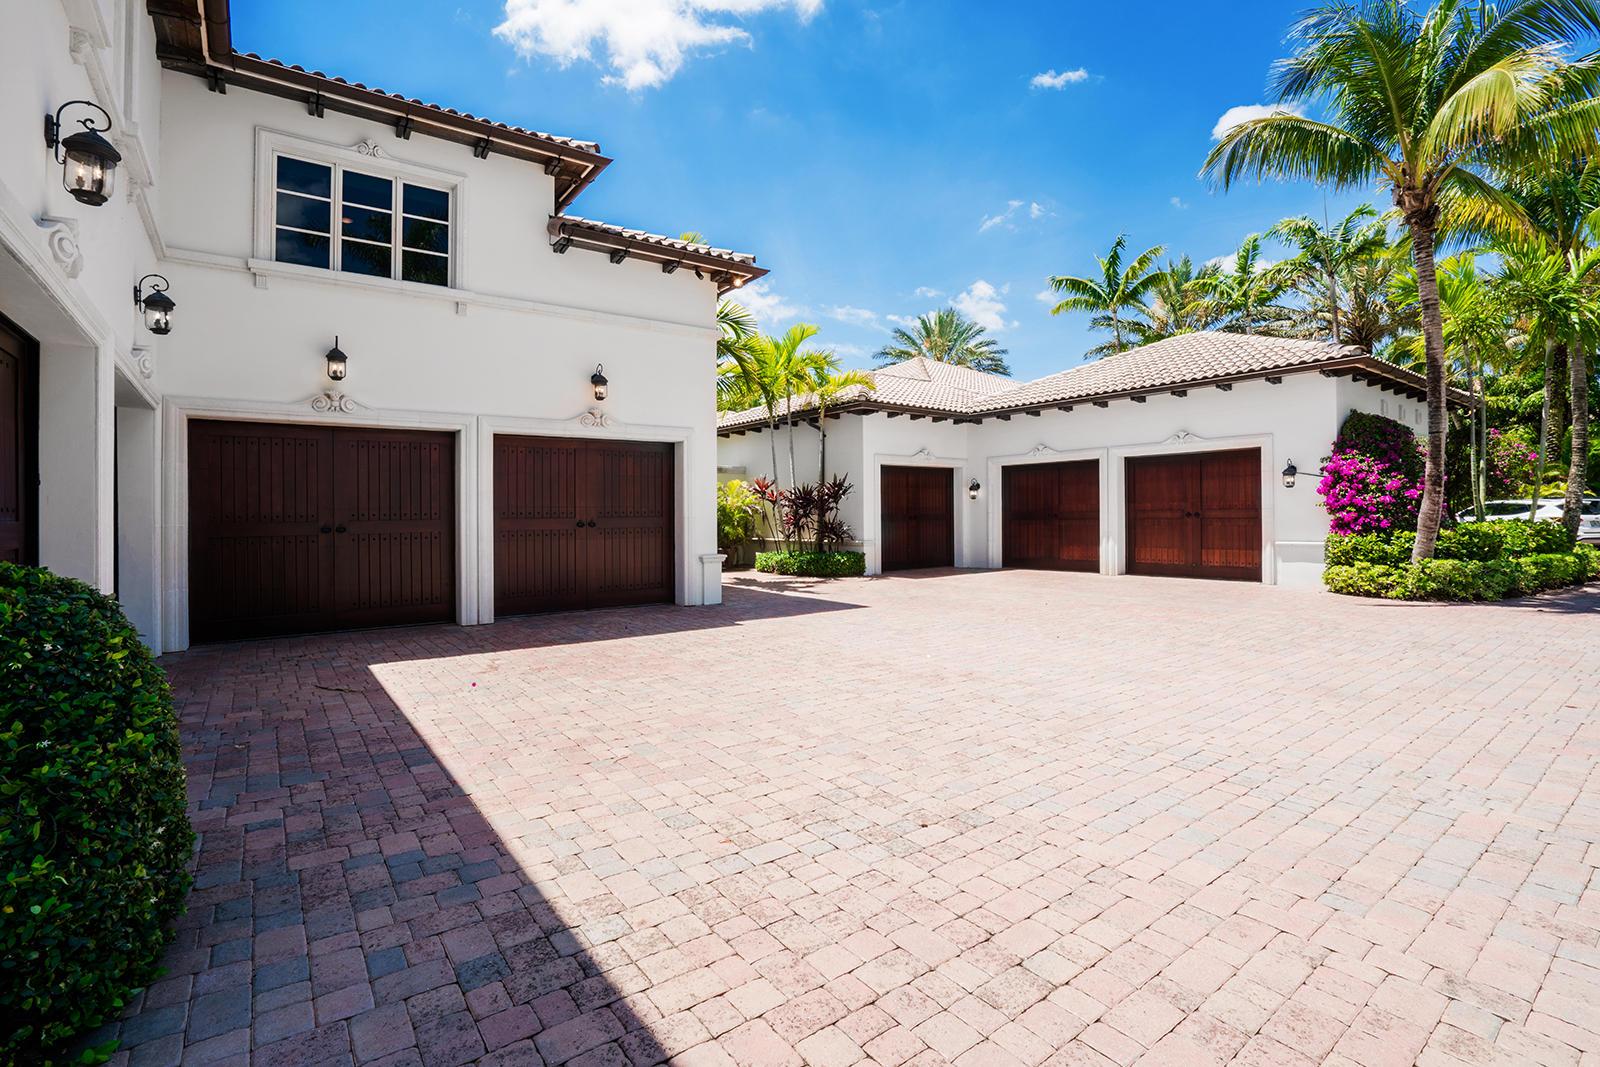 Boca Raton- Florida 33496, 9 Bedrooms Bedrooms, ,10 BathroomsBathrooms,Residential,For Sale,Princeton,RX-10440709